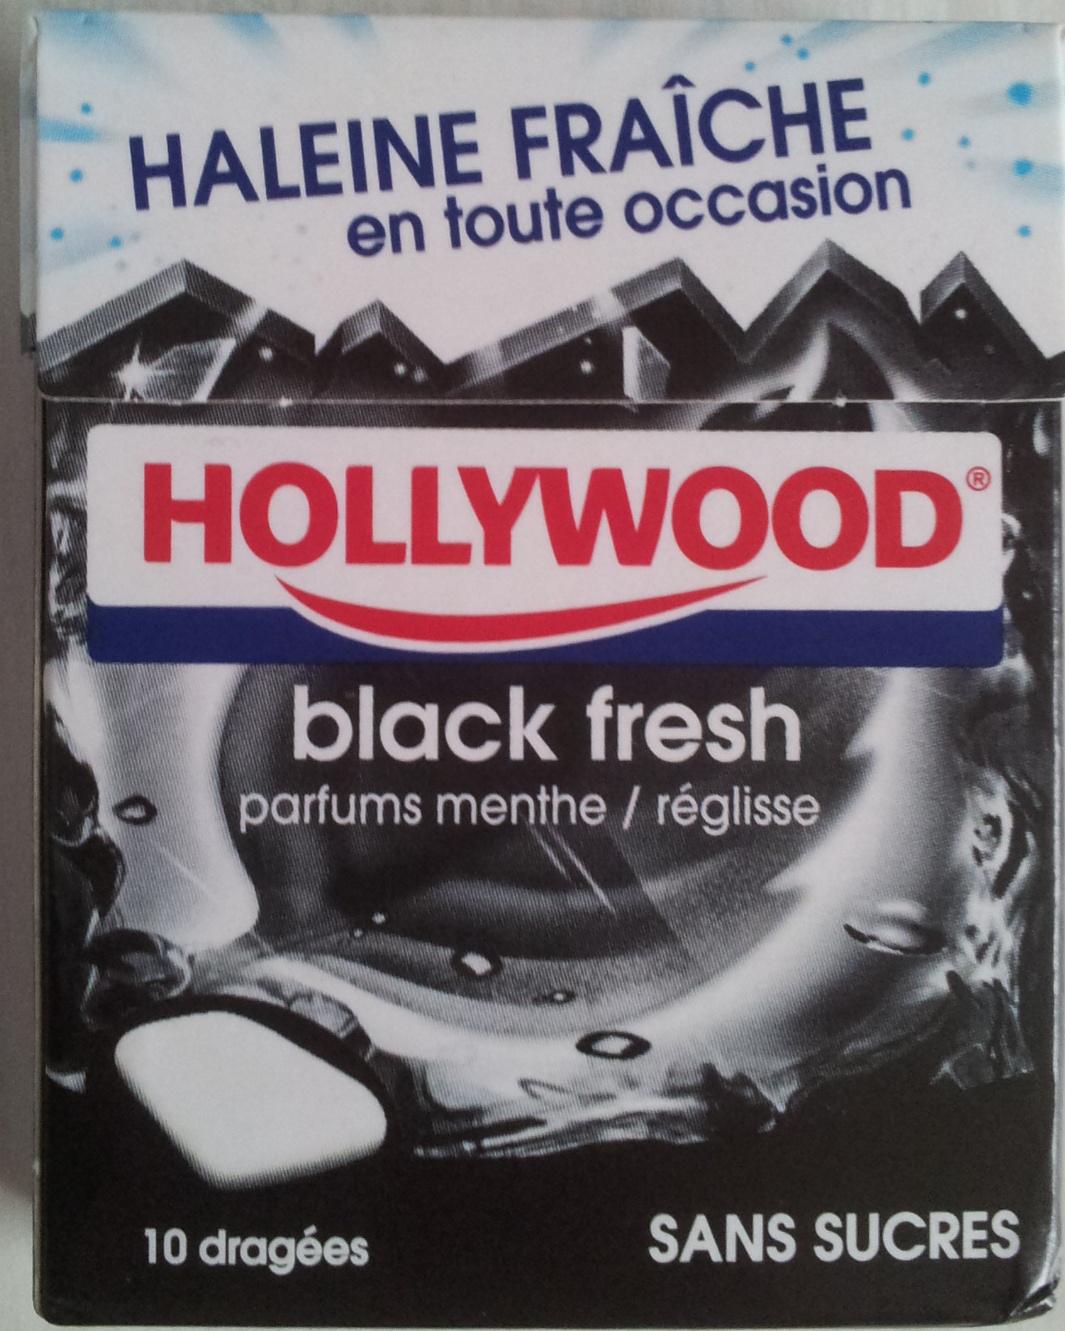 Black fresh - Hollywood - 14,5 g